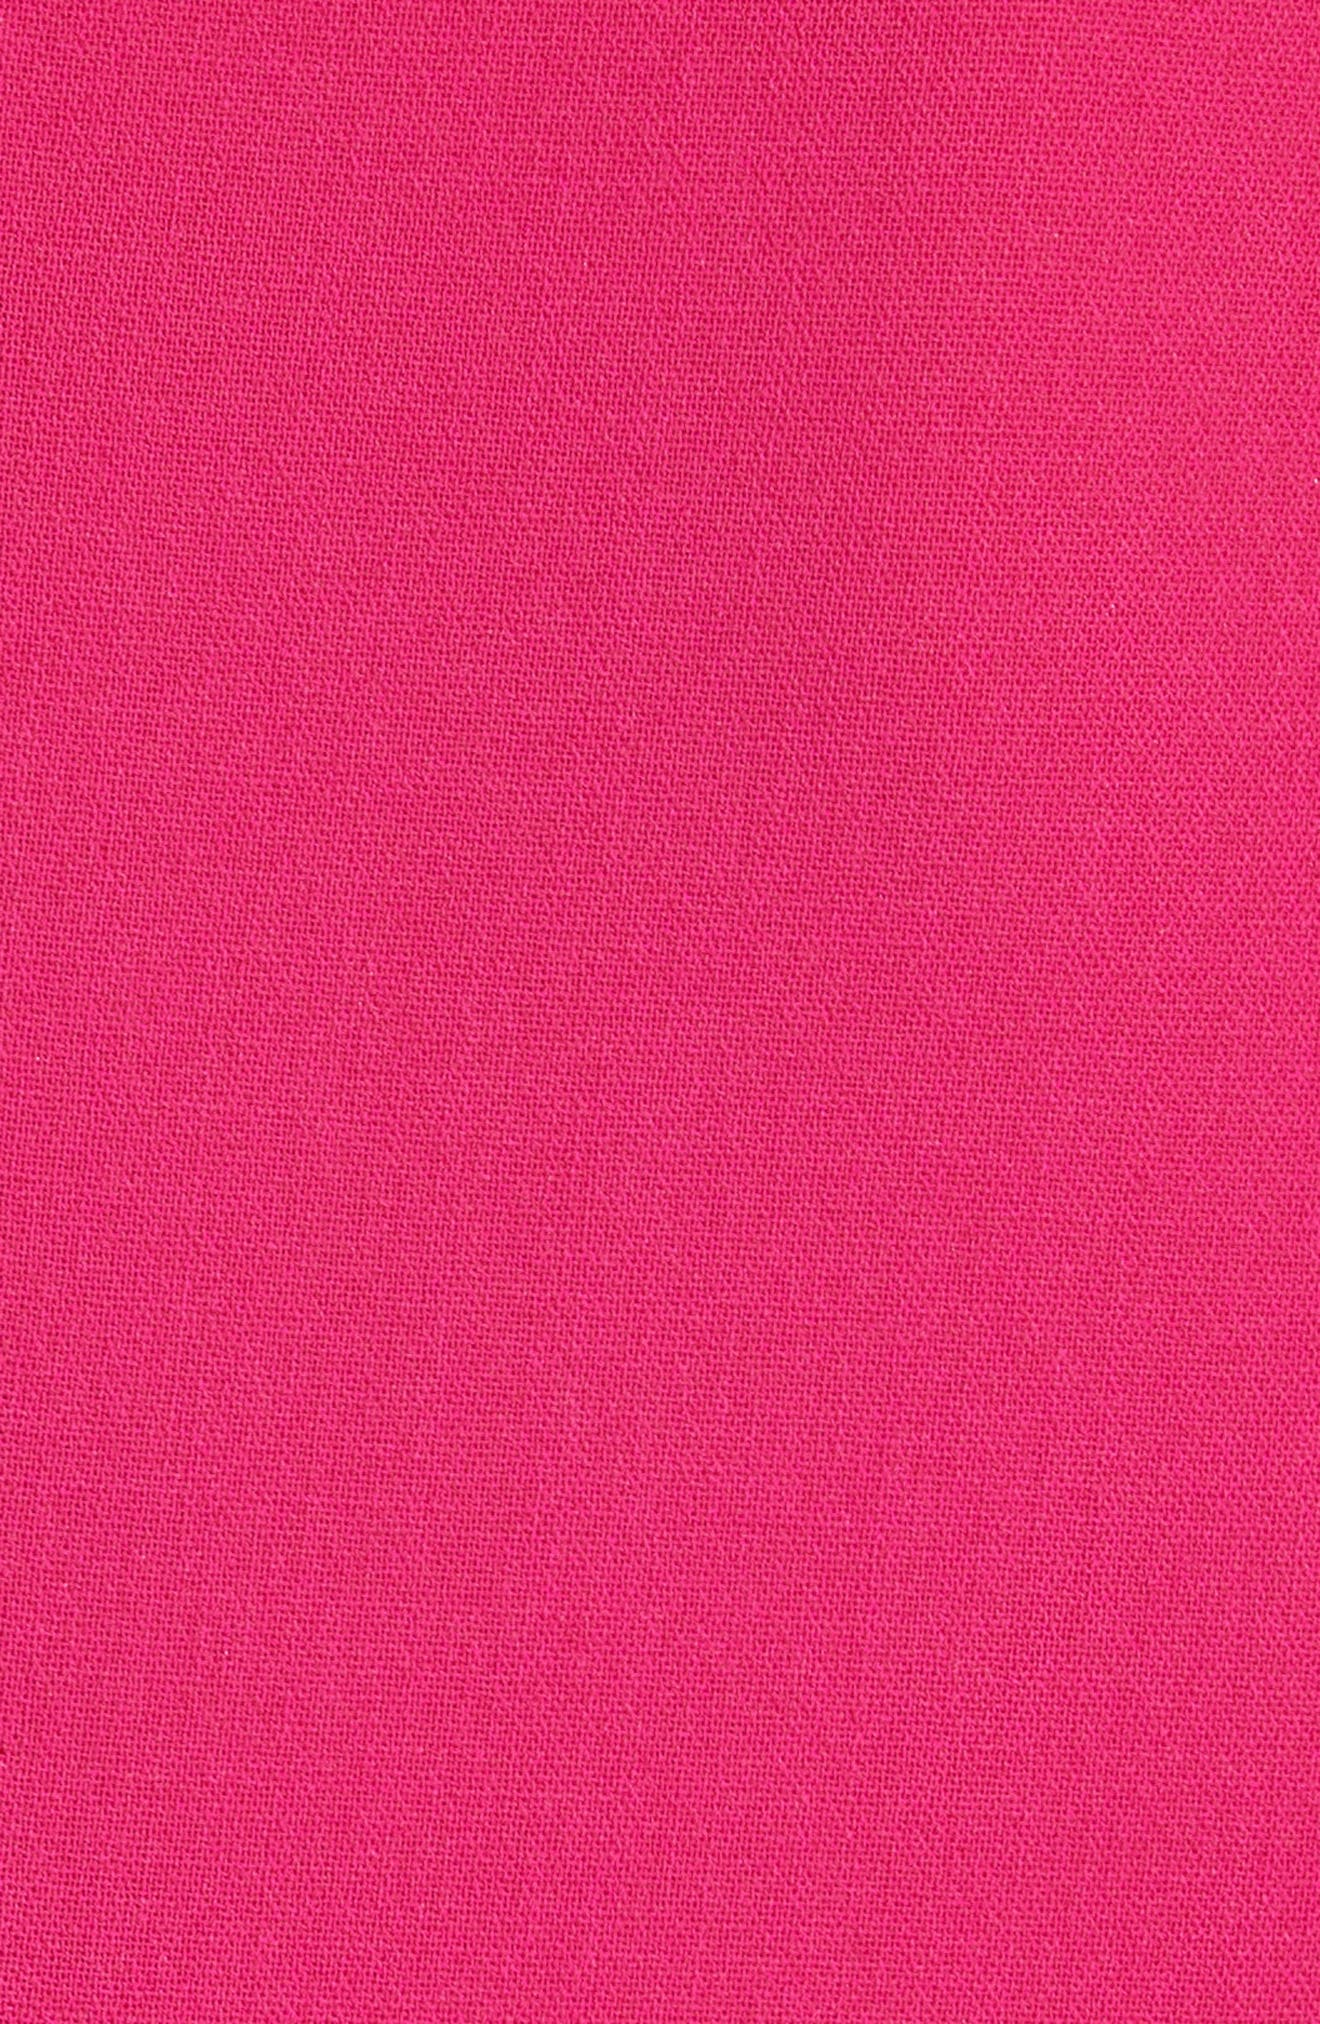 Alternate Image 3  - Michael Kors Bell Cuff Sheath Dress